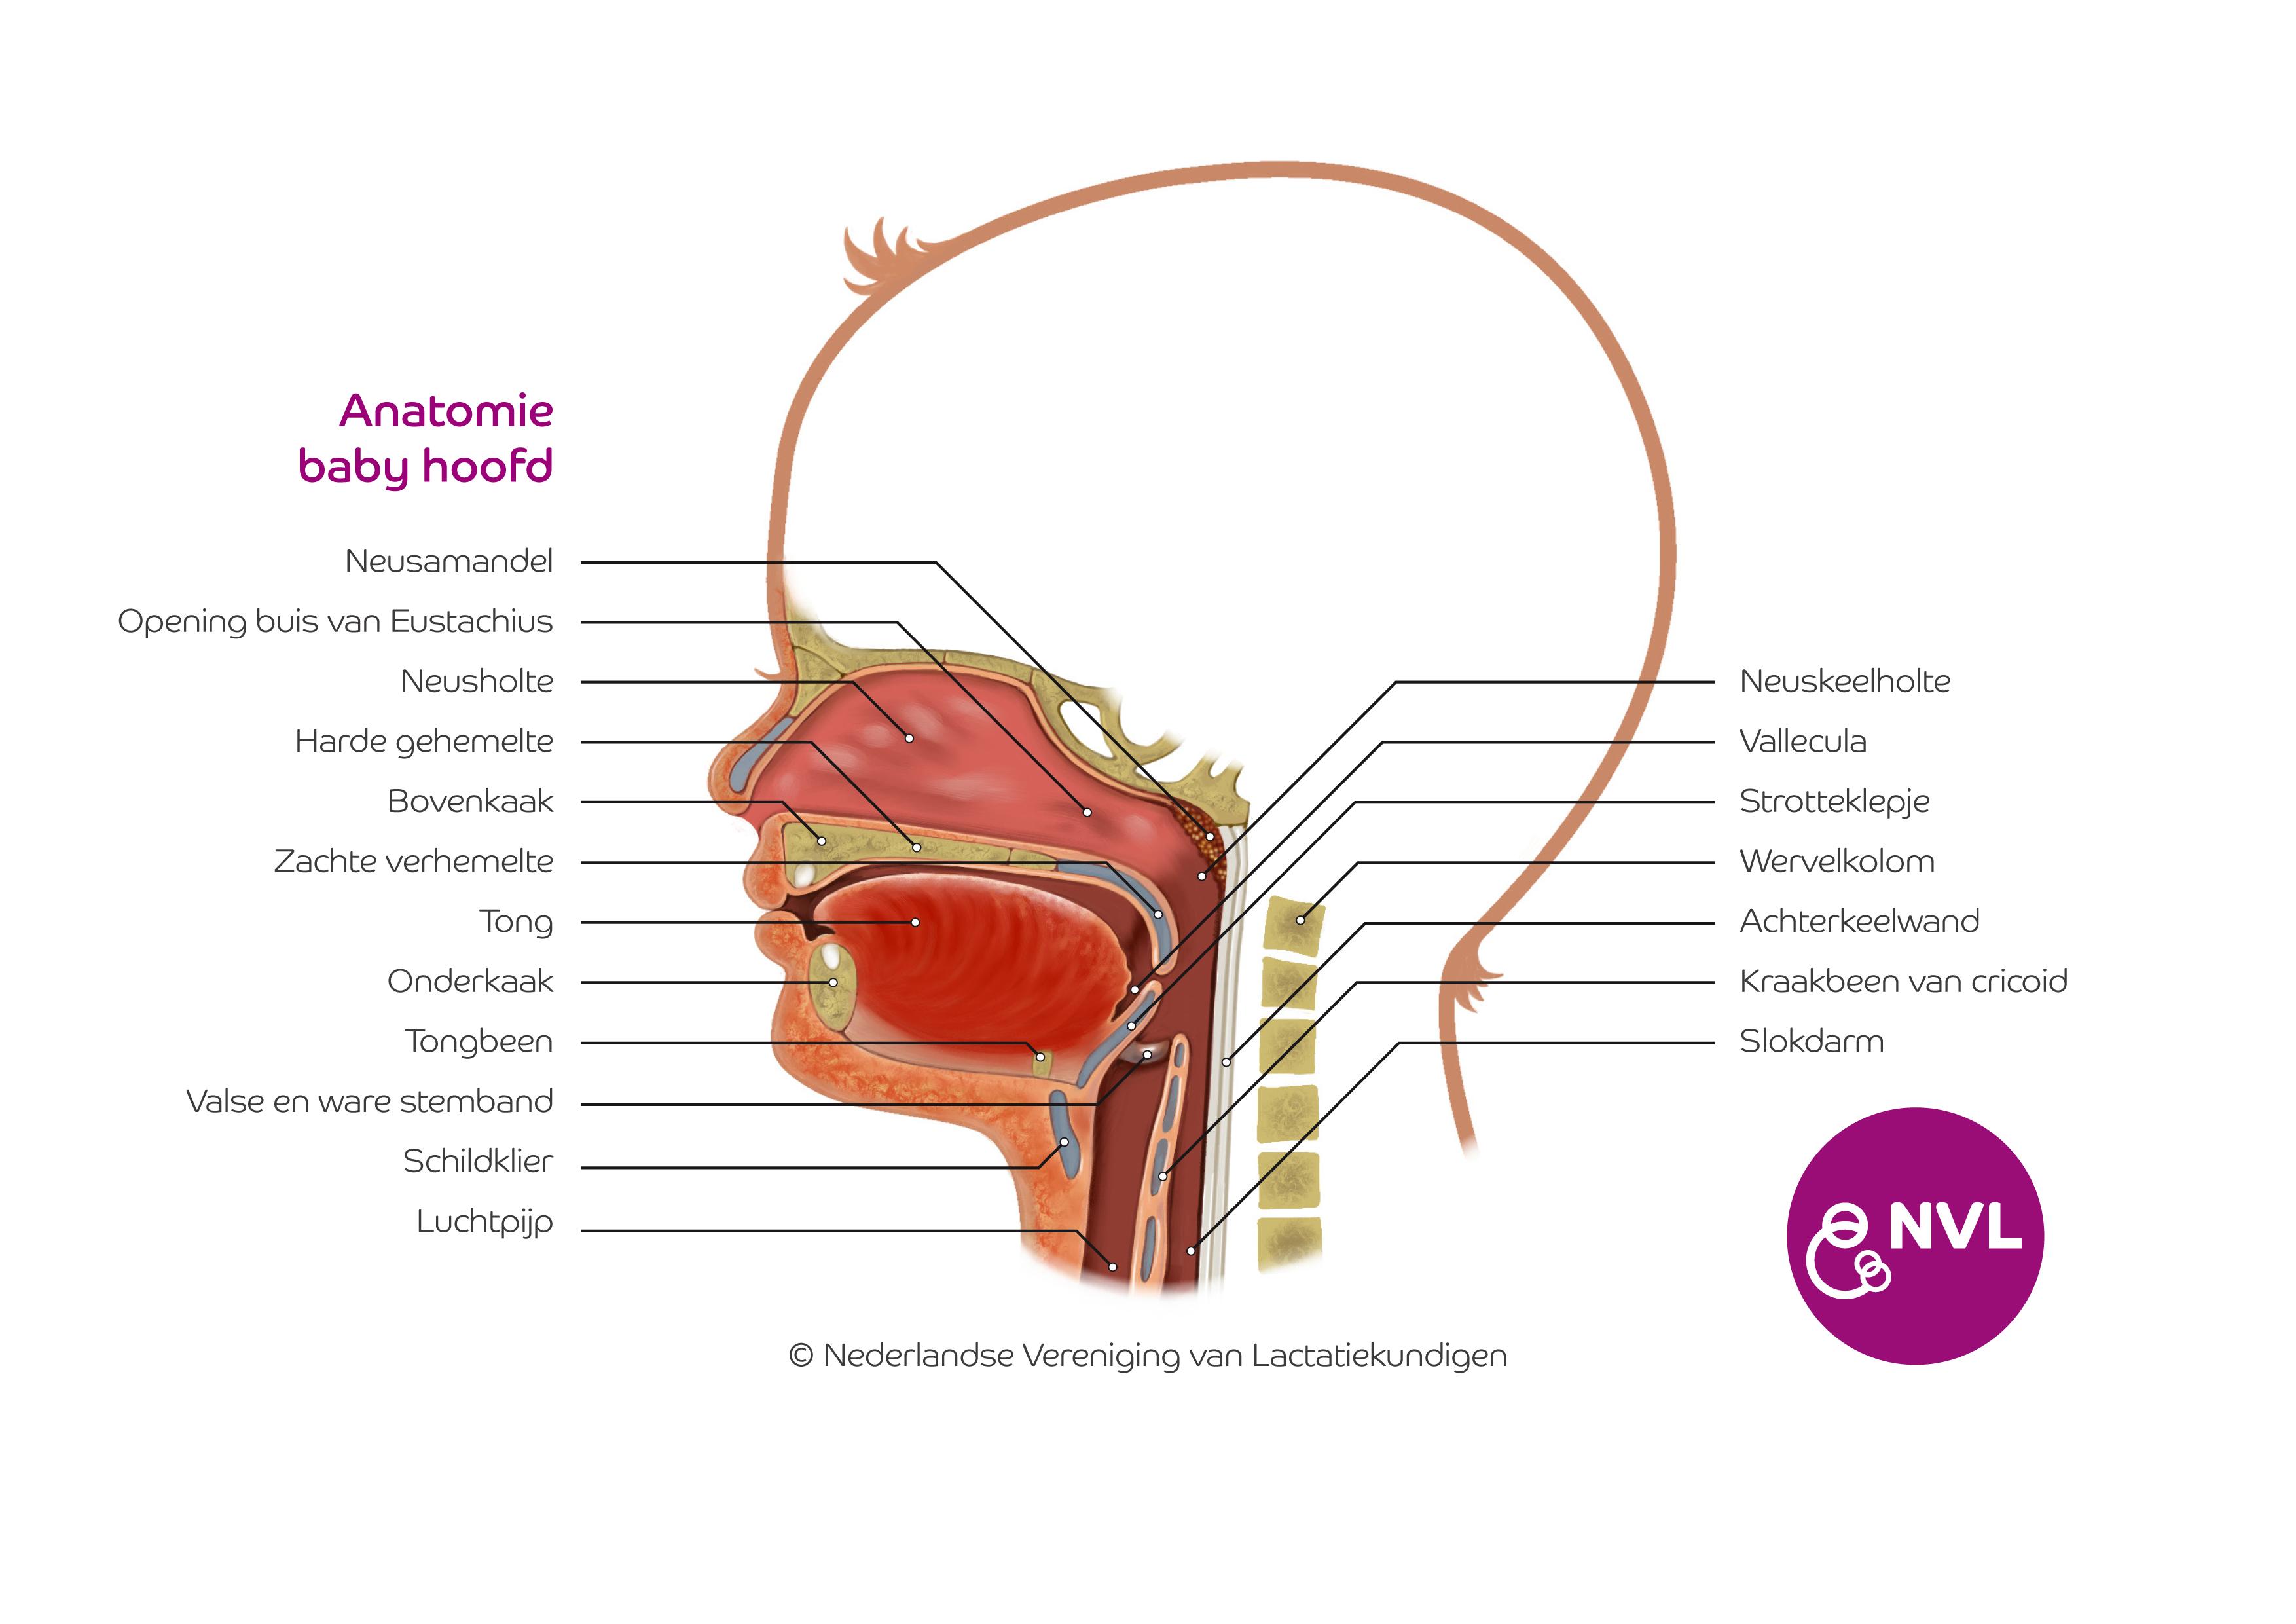 Anatomie Hoofd Baby